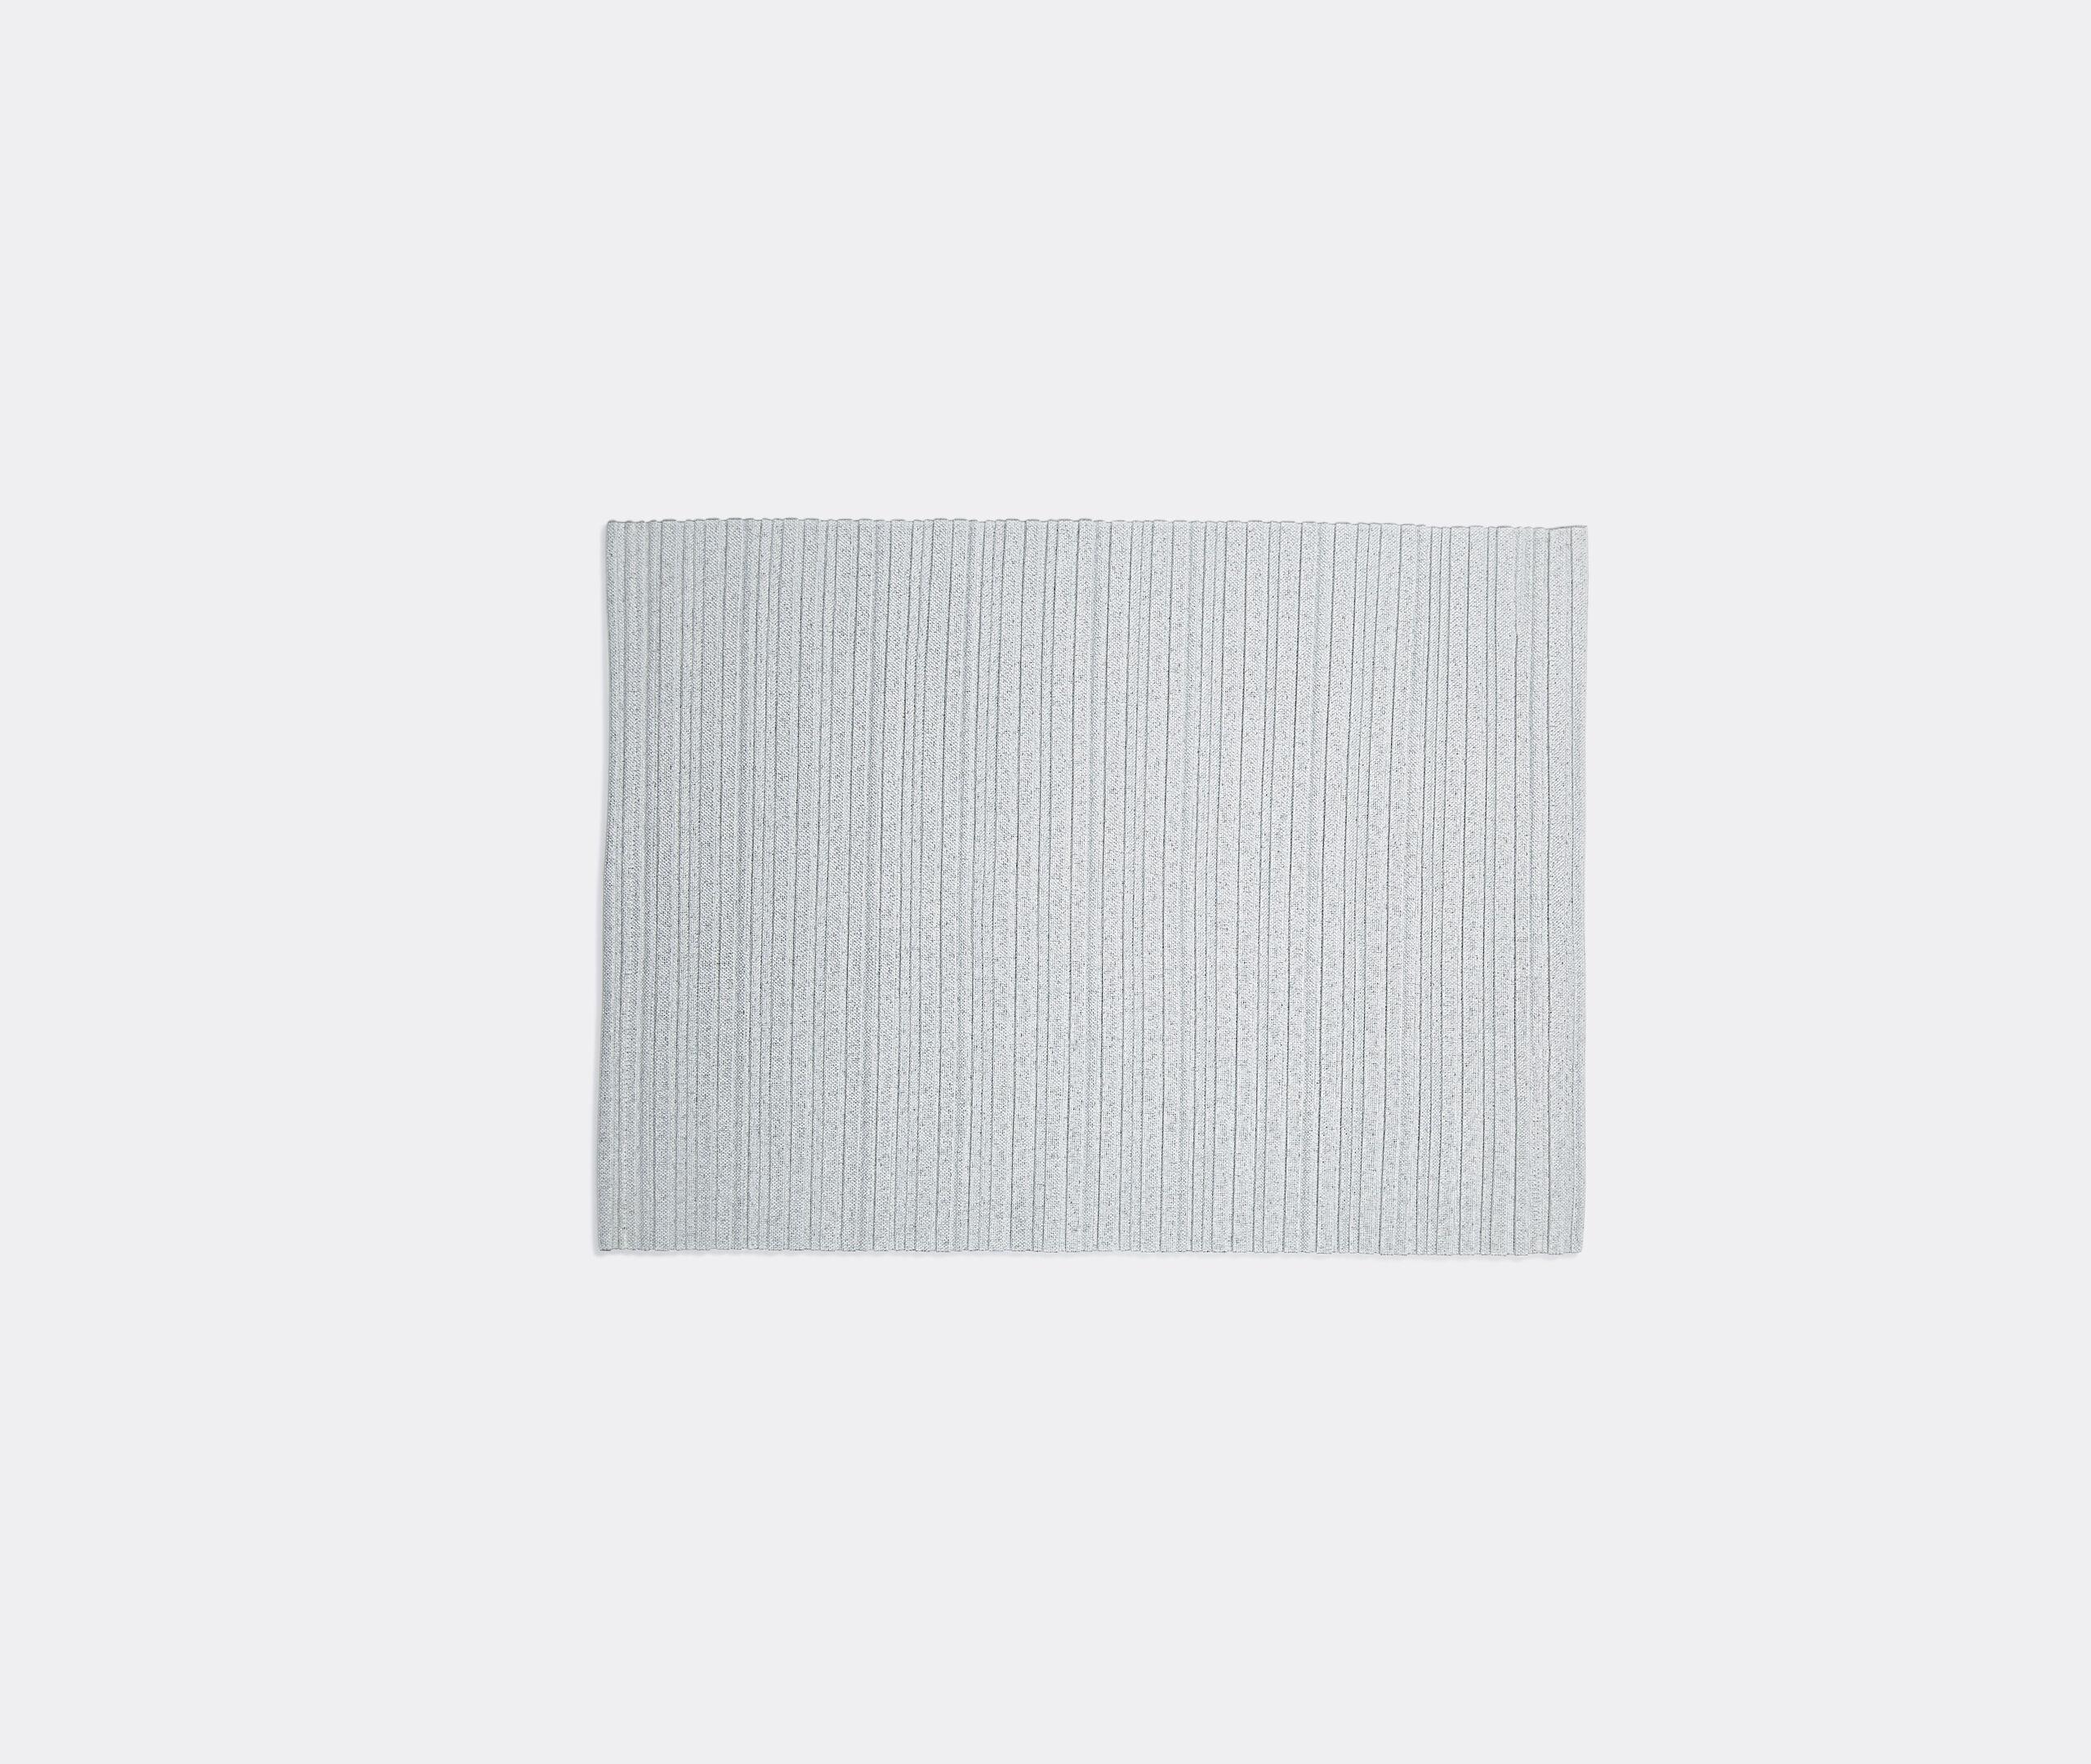 Ixi Placemat 36X48Cm Random Light Grey